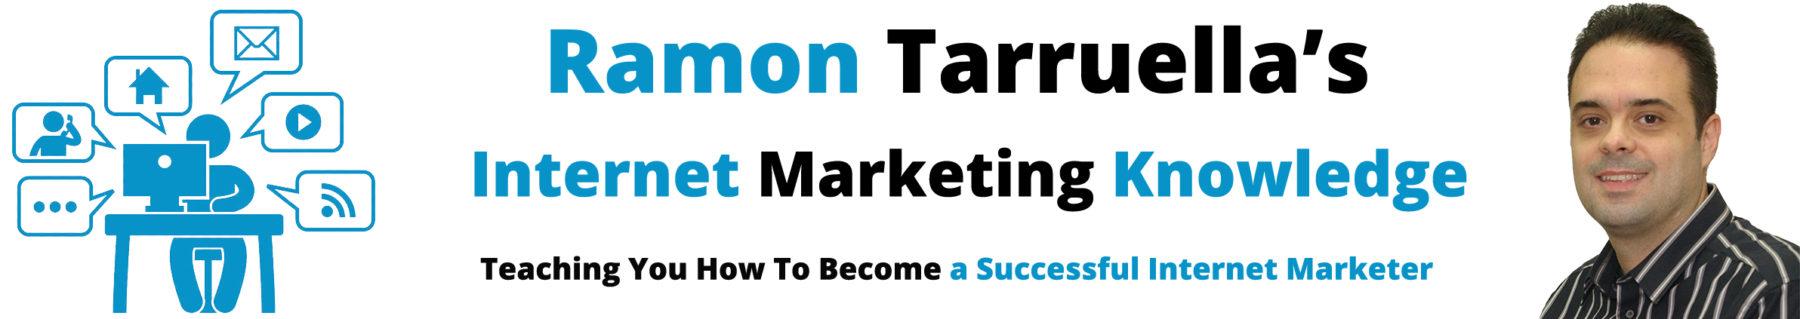 Ramon Tarruella's Internet Markting Blog